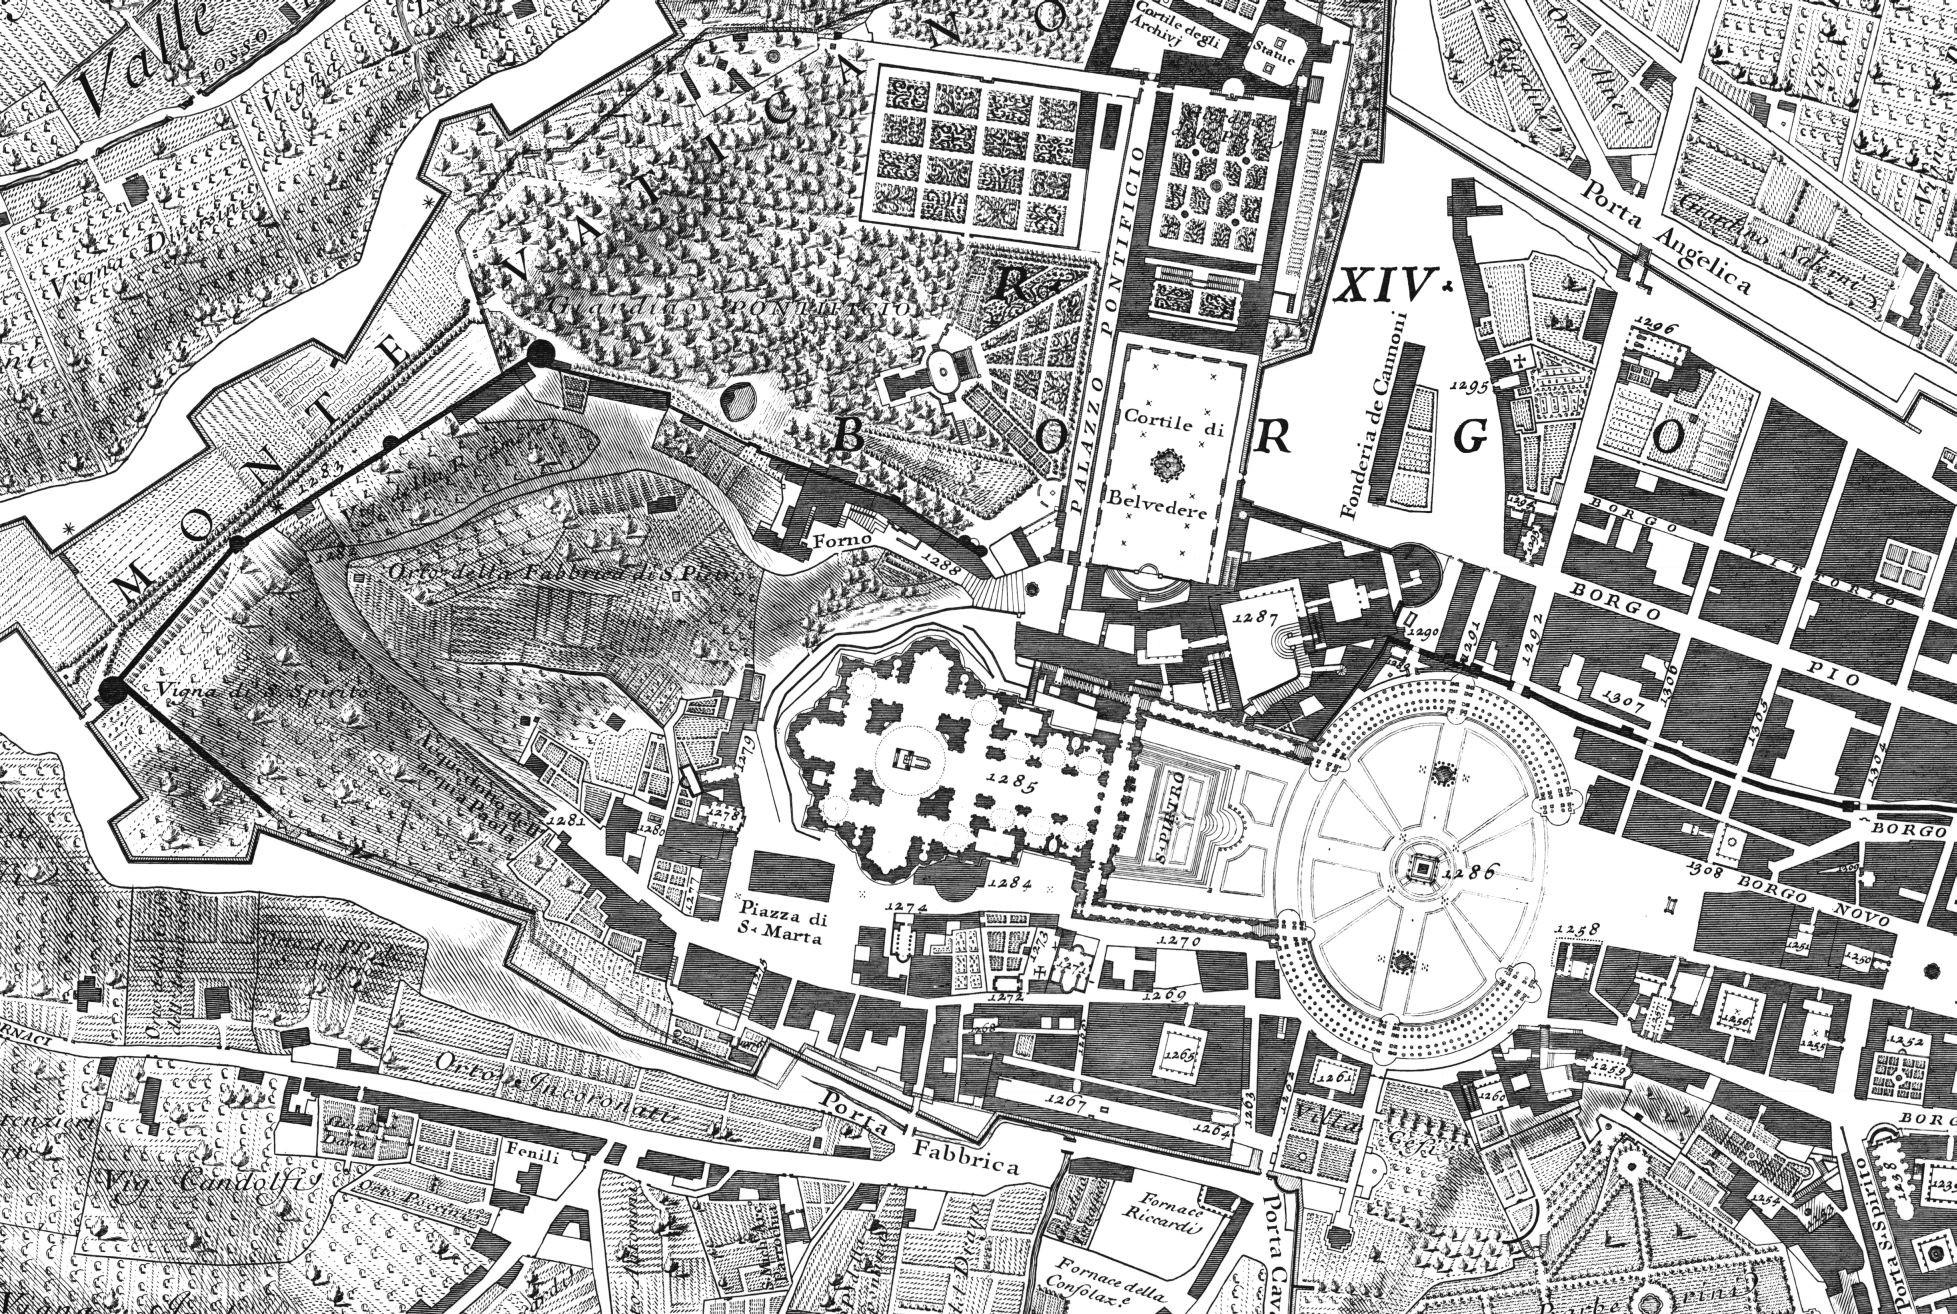 Plano de Roma por Giambattista Nolli, 1784 (detalle, El Vaticano)